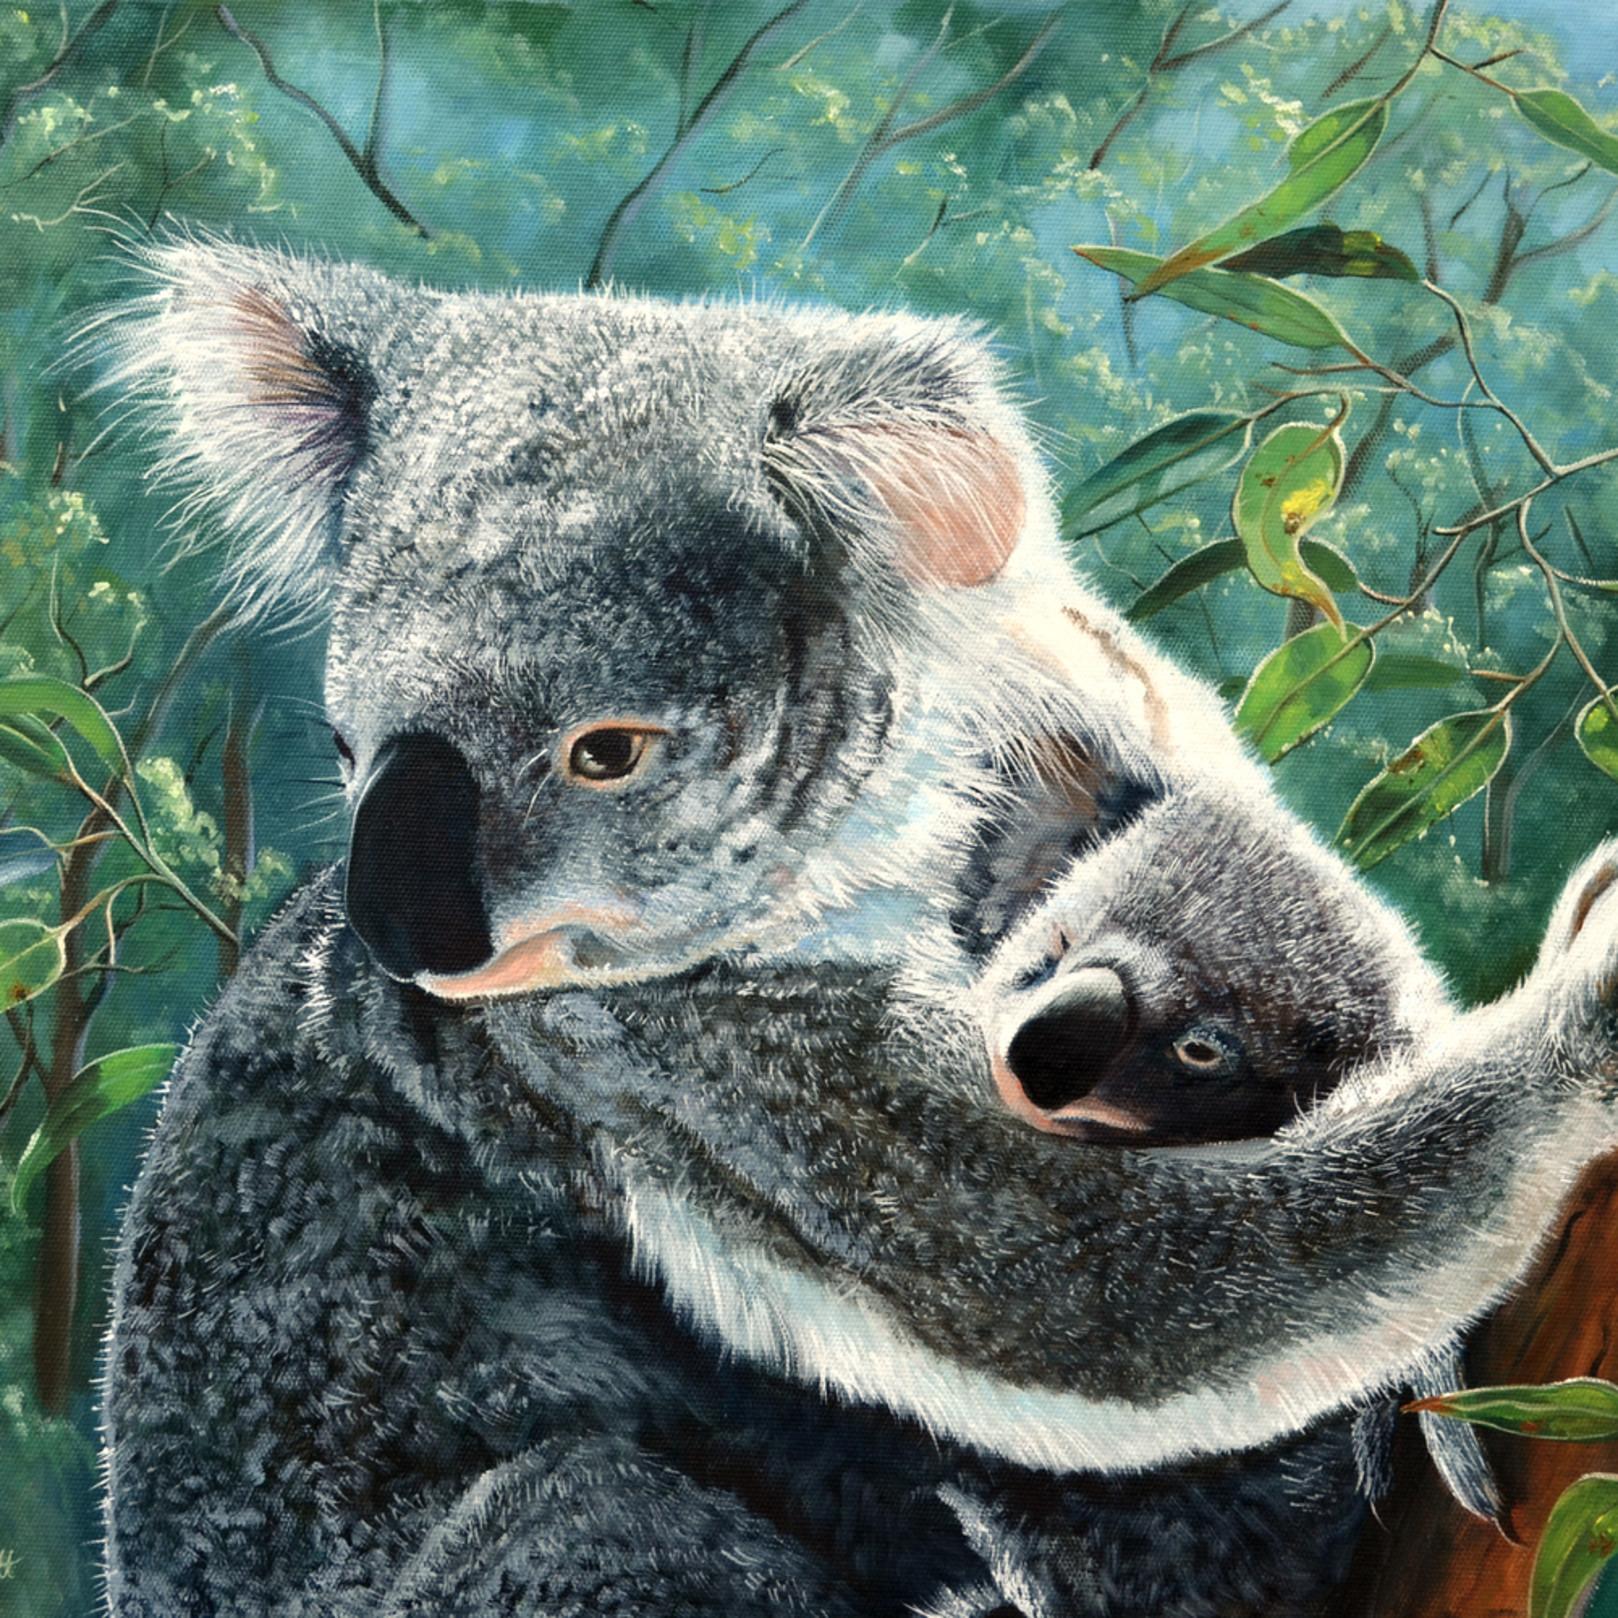 Koalaandbaby amothersloveeditedsocialmedia2 kmt5nj